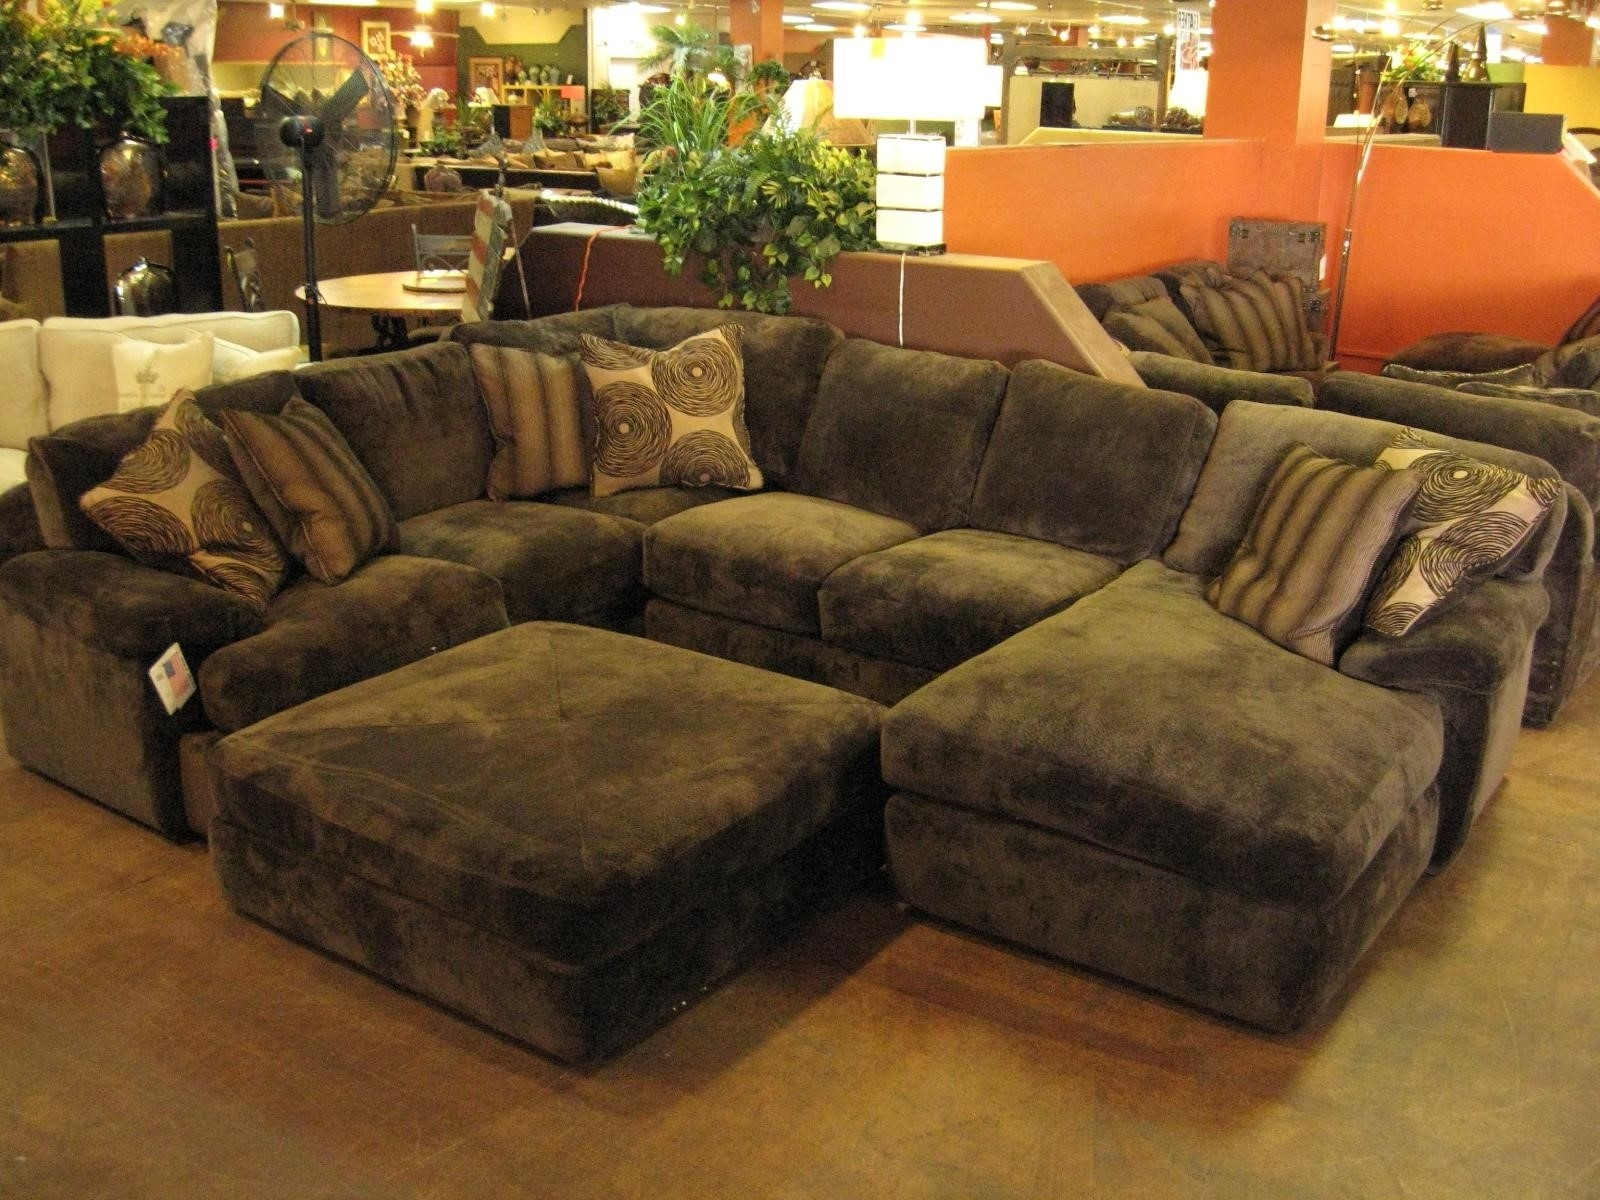 Sectional Sofas Large Sofa With Ottoman Regard To Idea 11 with Sofas With Large Ottoman (Image 10 of 10)